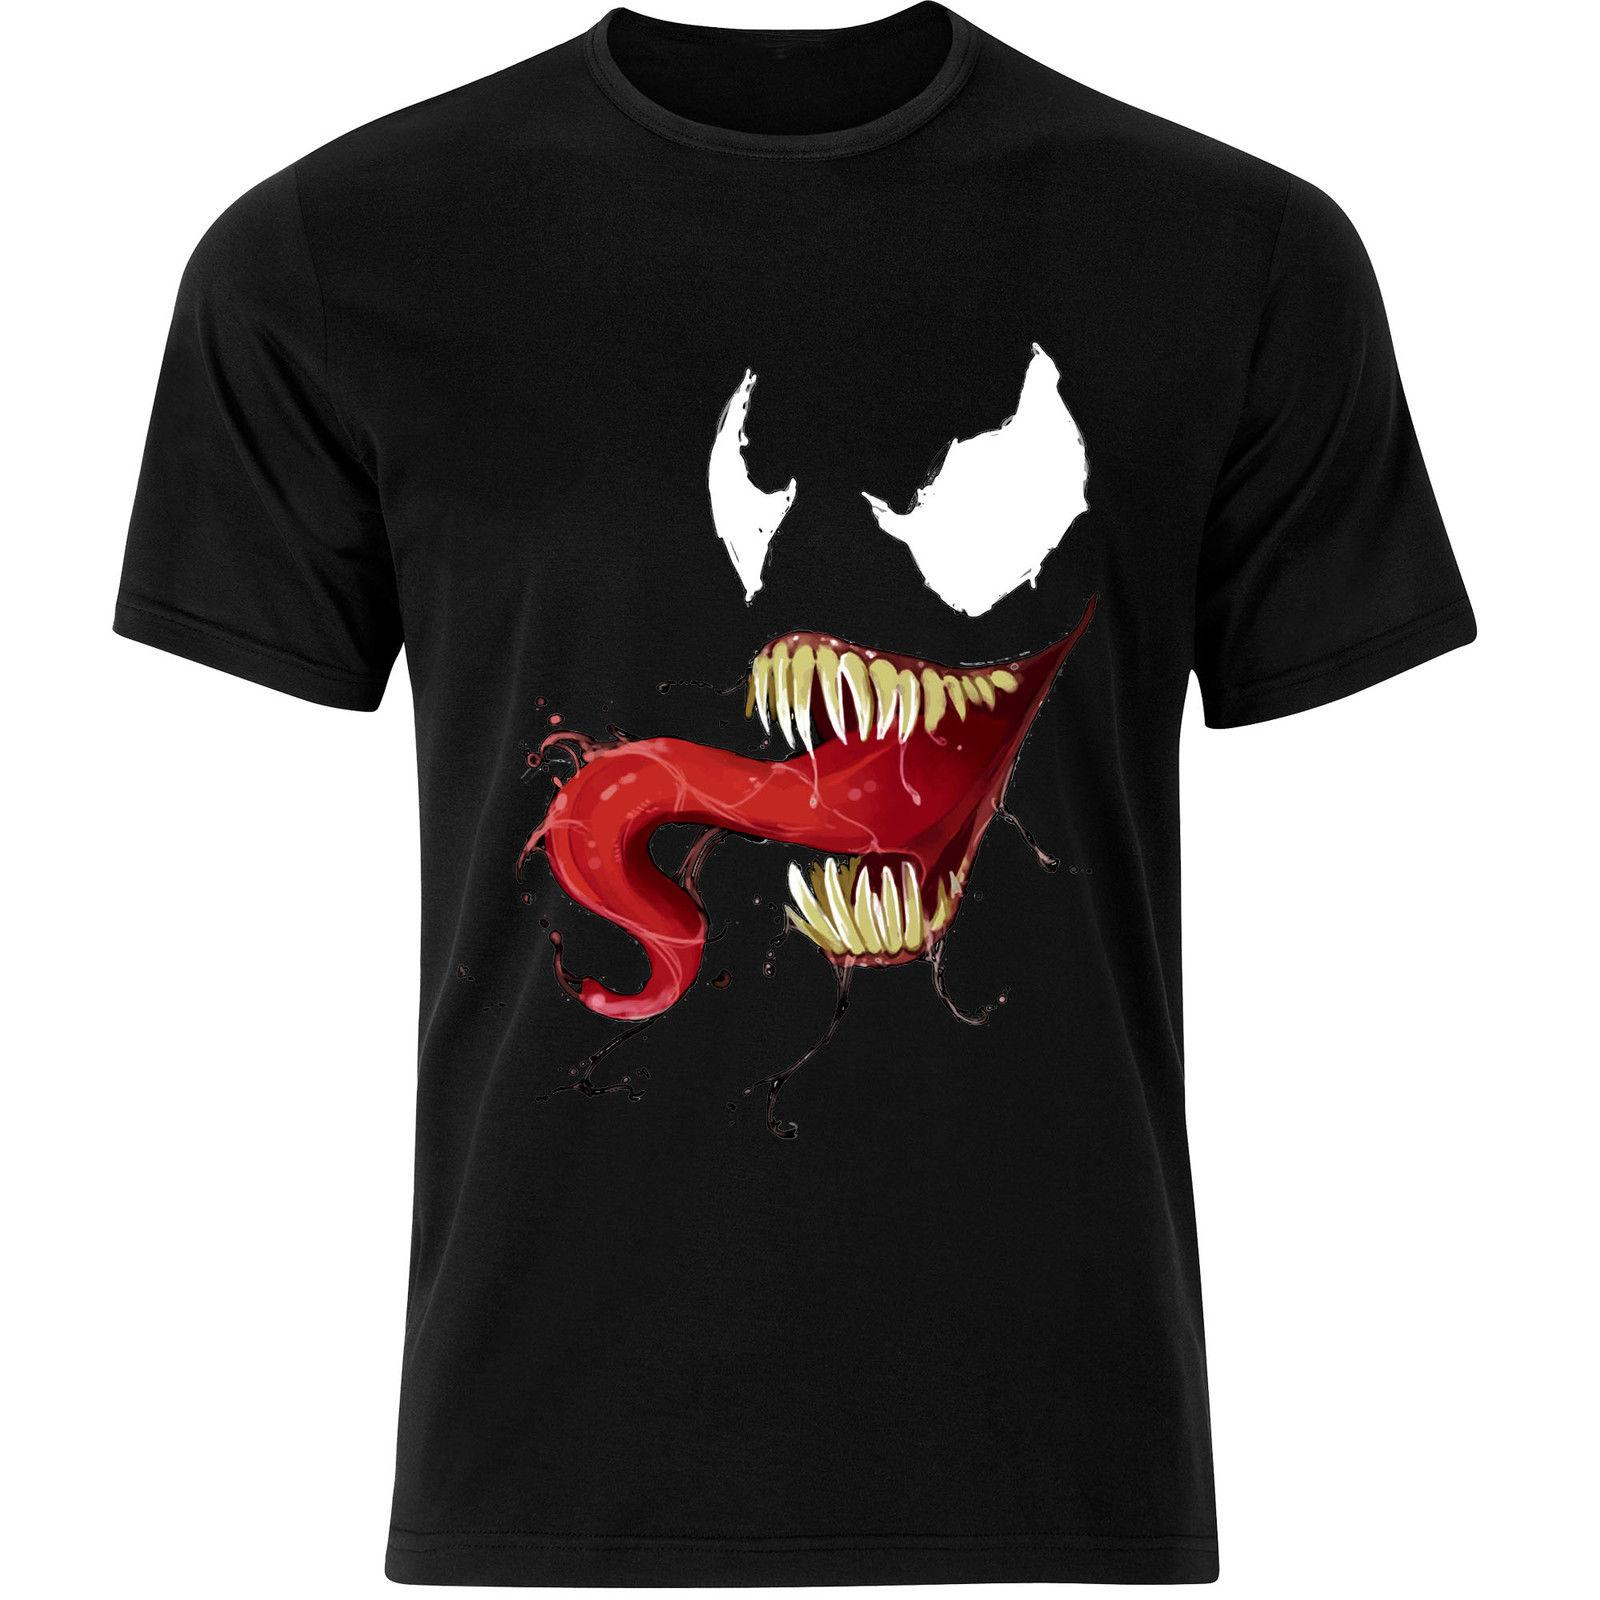 d86f71d5 Venom Dark Spiderman Symbiote Villain Anti Hero Marvel Mens Tshirt Tee Top  AB10 Cheap Wholesale Tees,100% Cotton For Man,T Shirt Printing Best T Shirts  ...